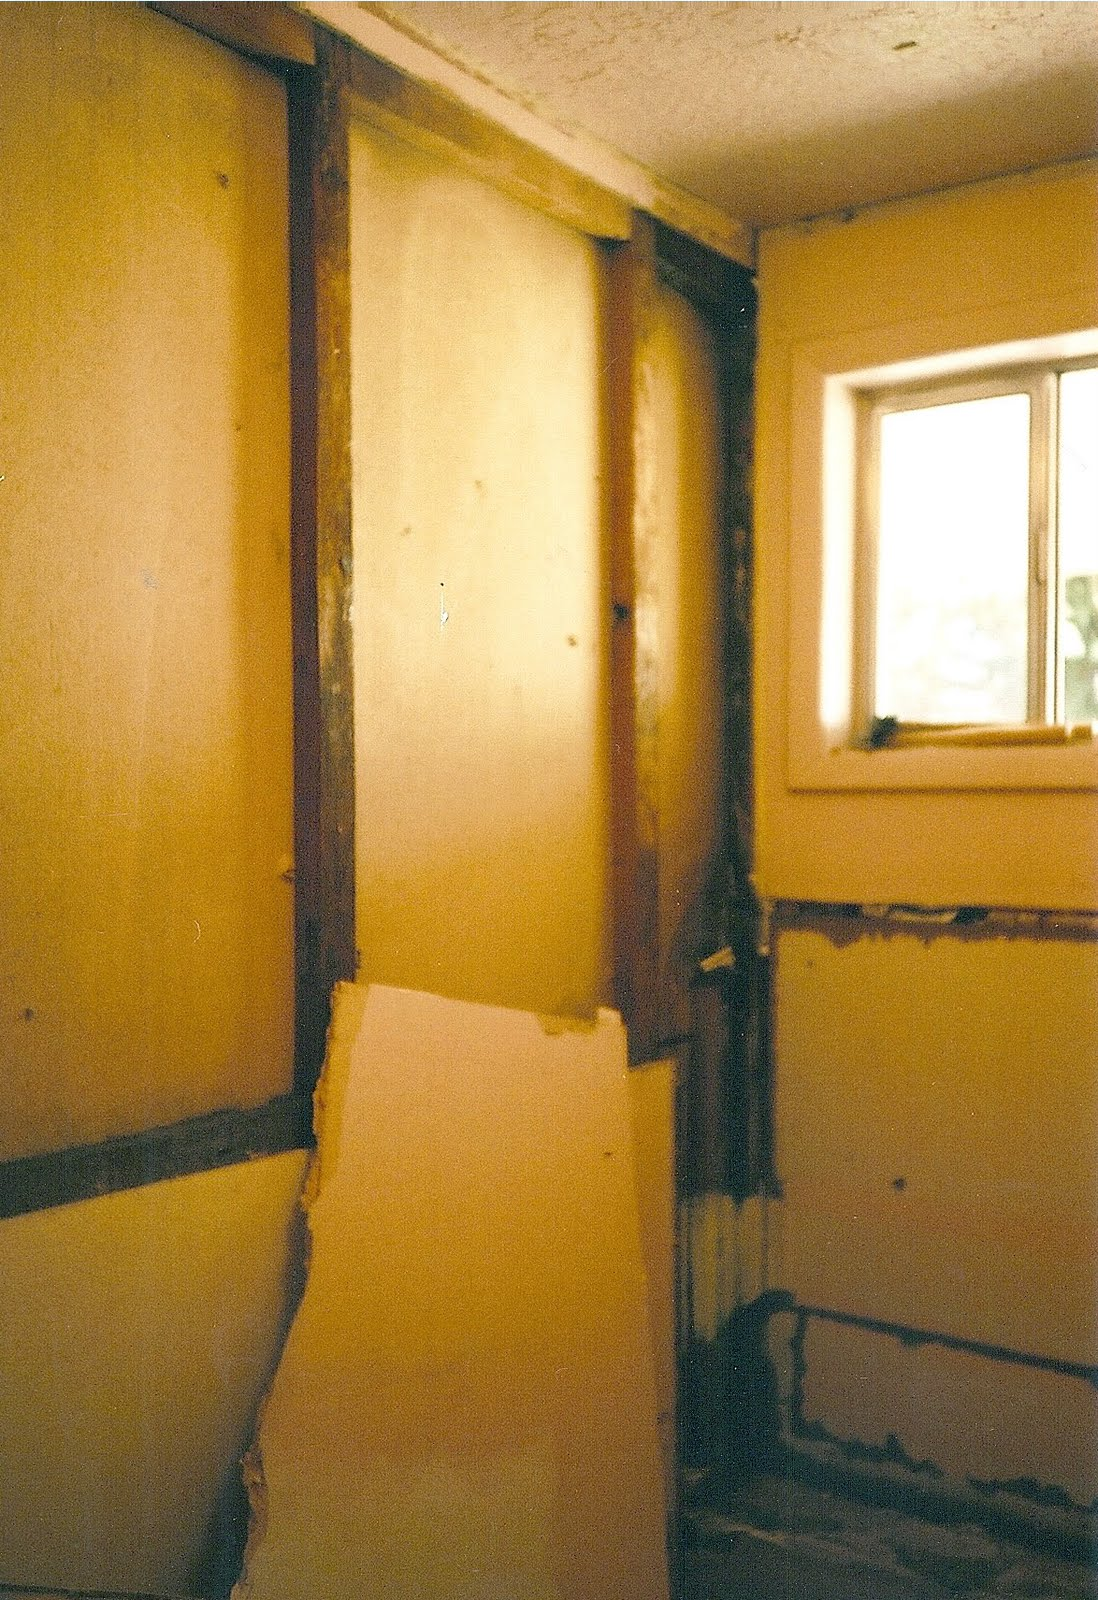 Break Room Remodel Ideas